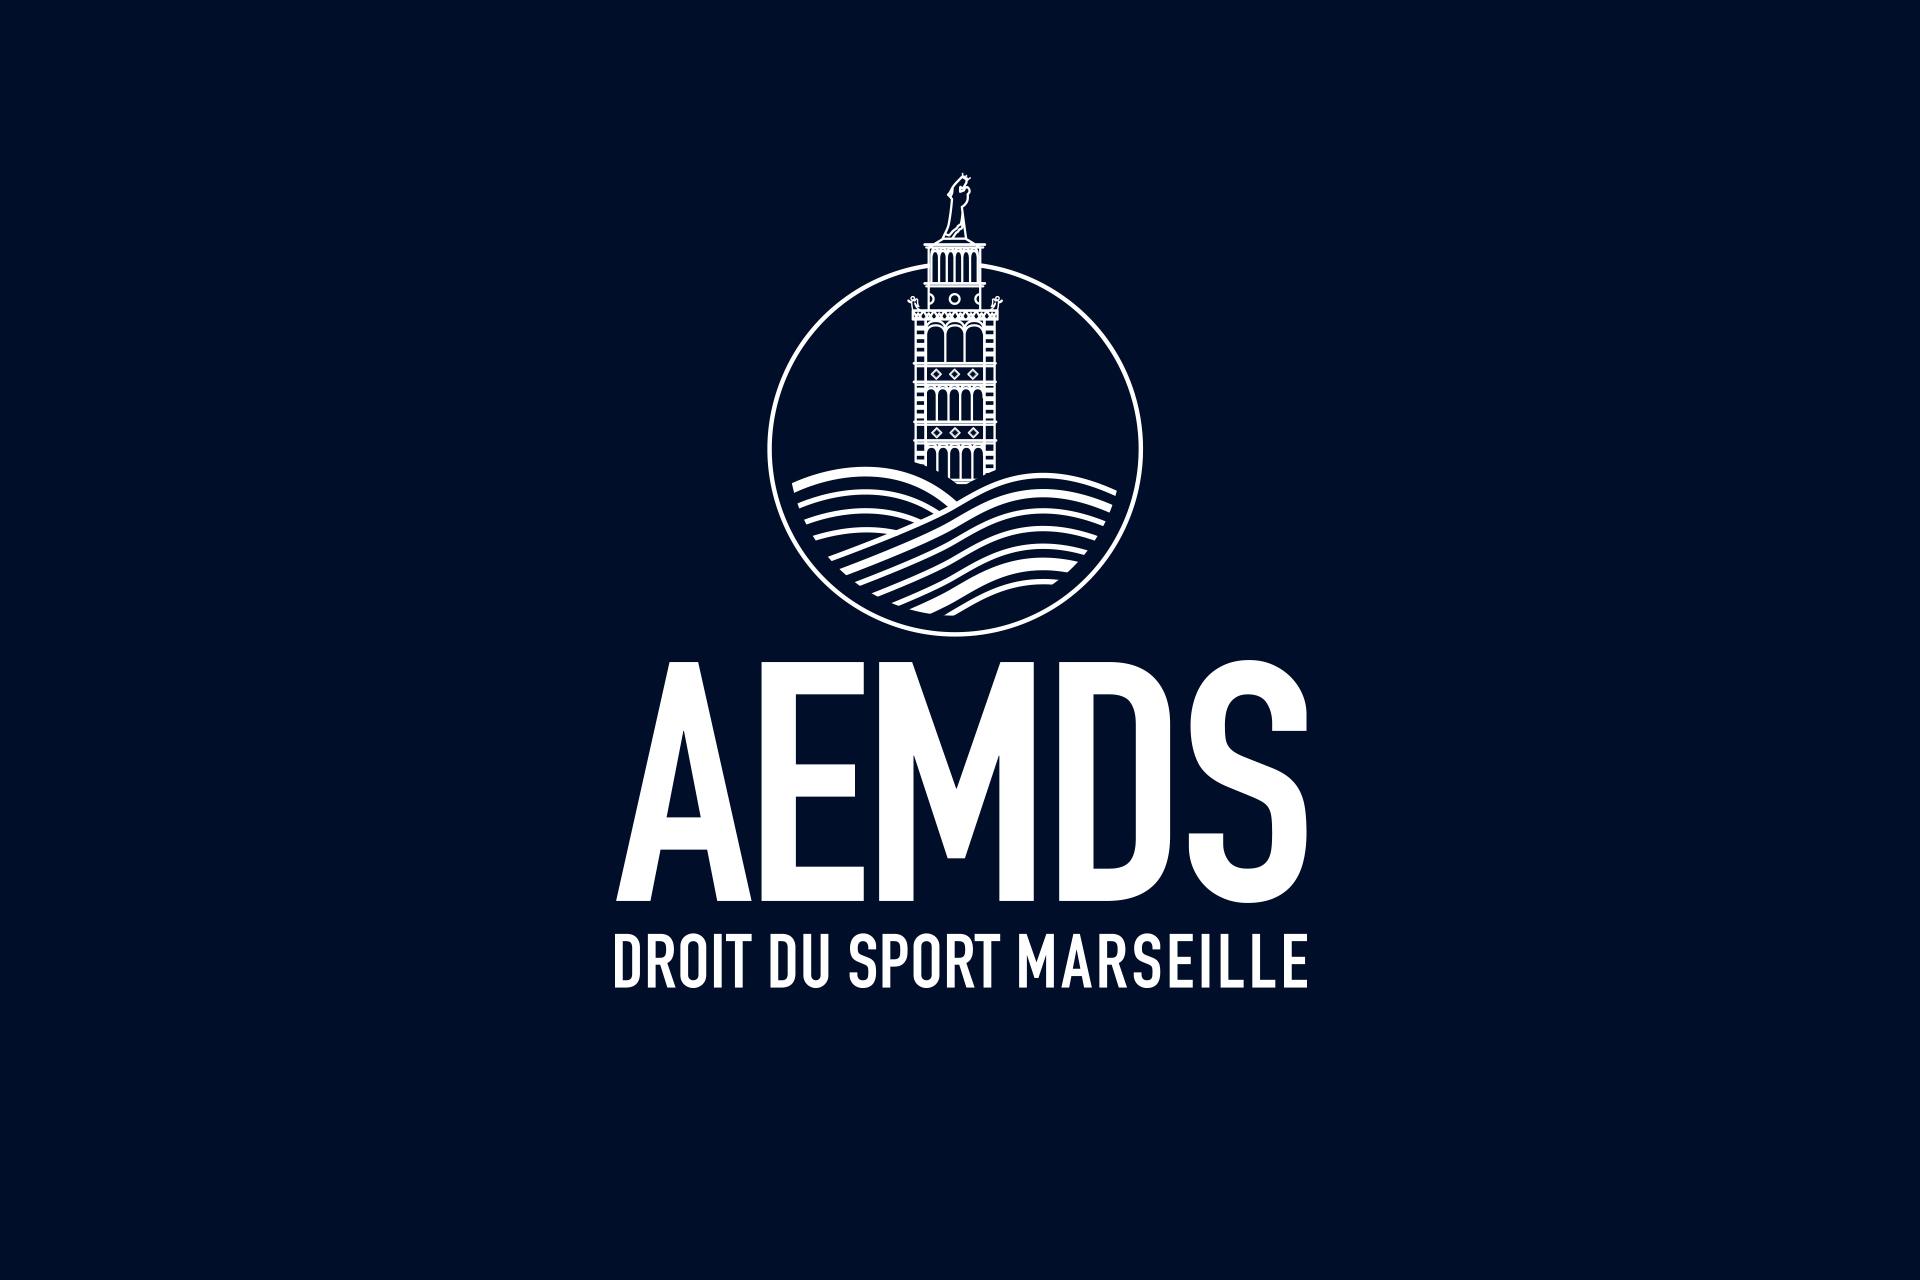 Logo AEMDS déclinaison blanc